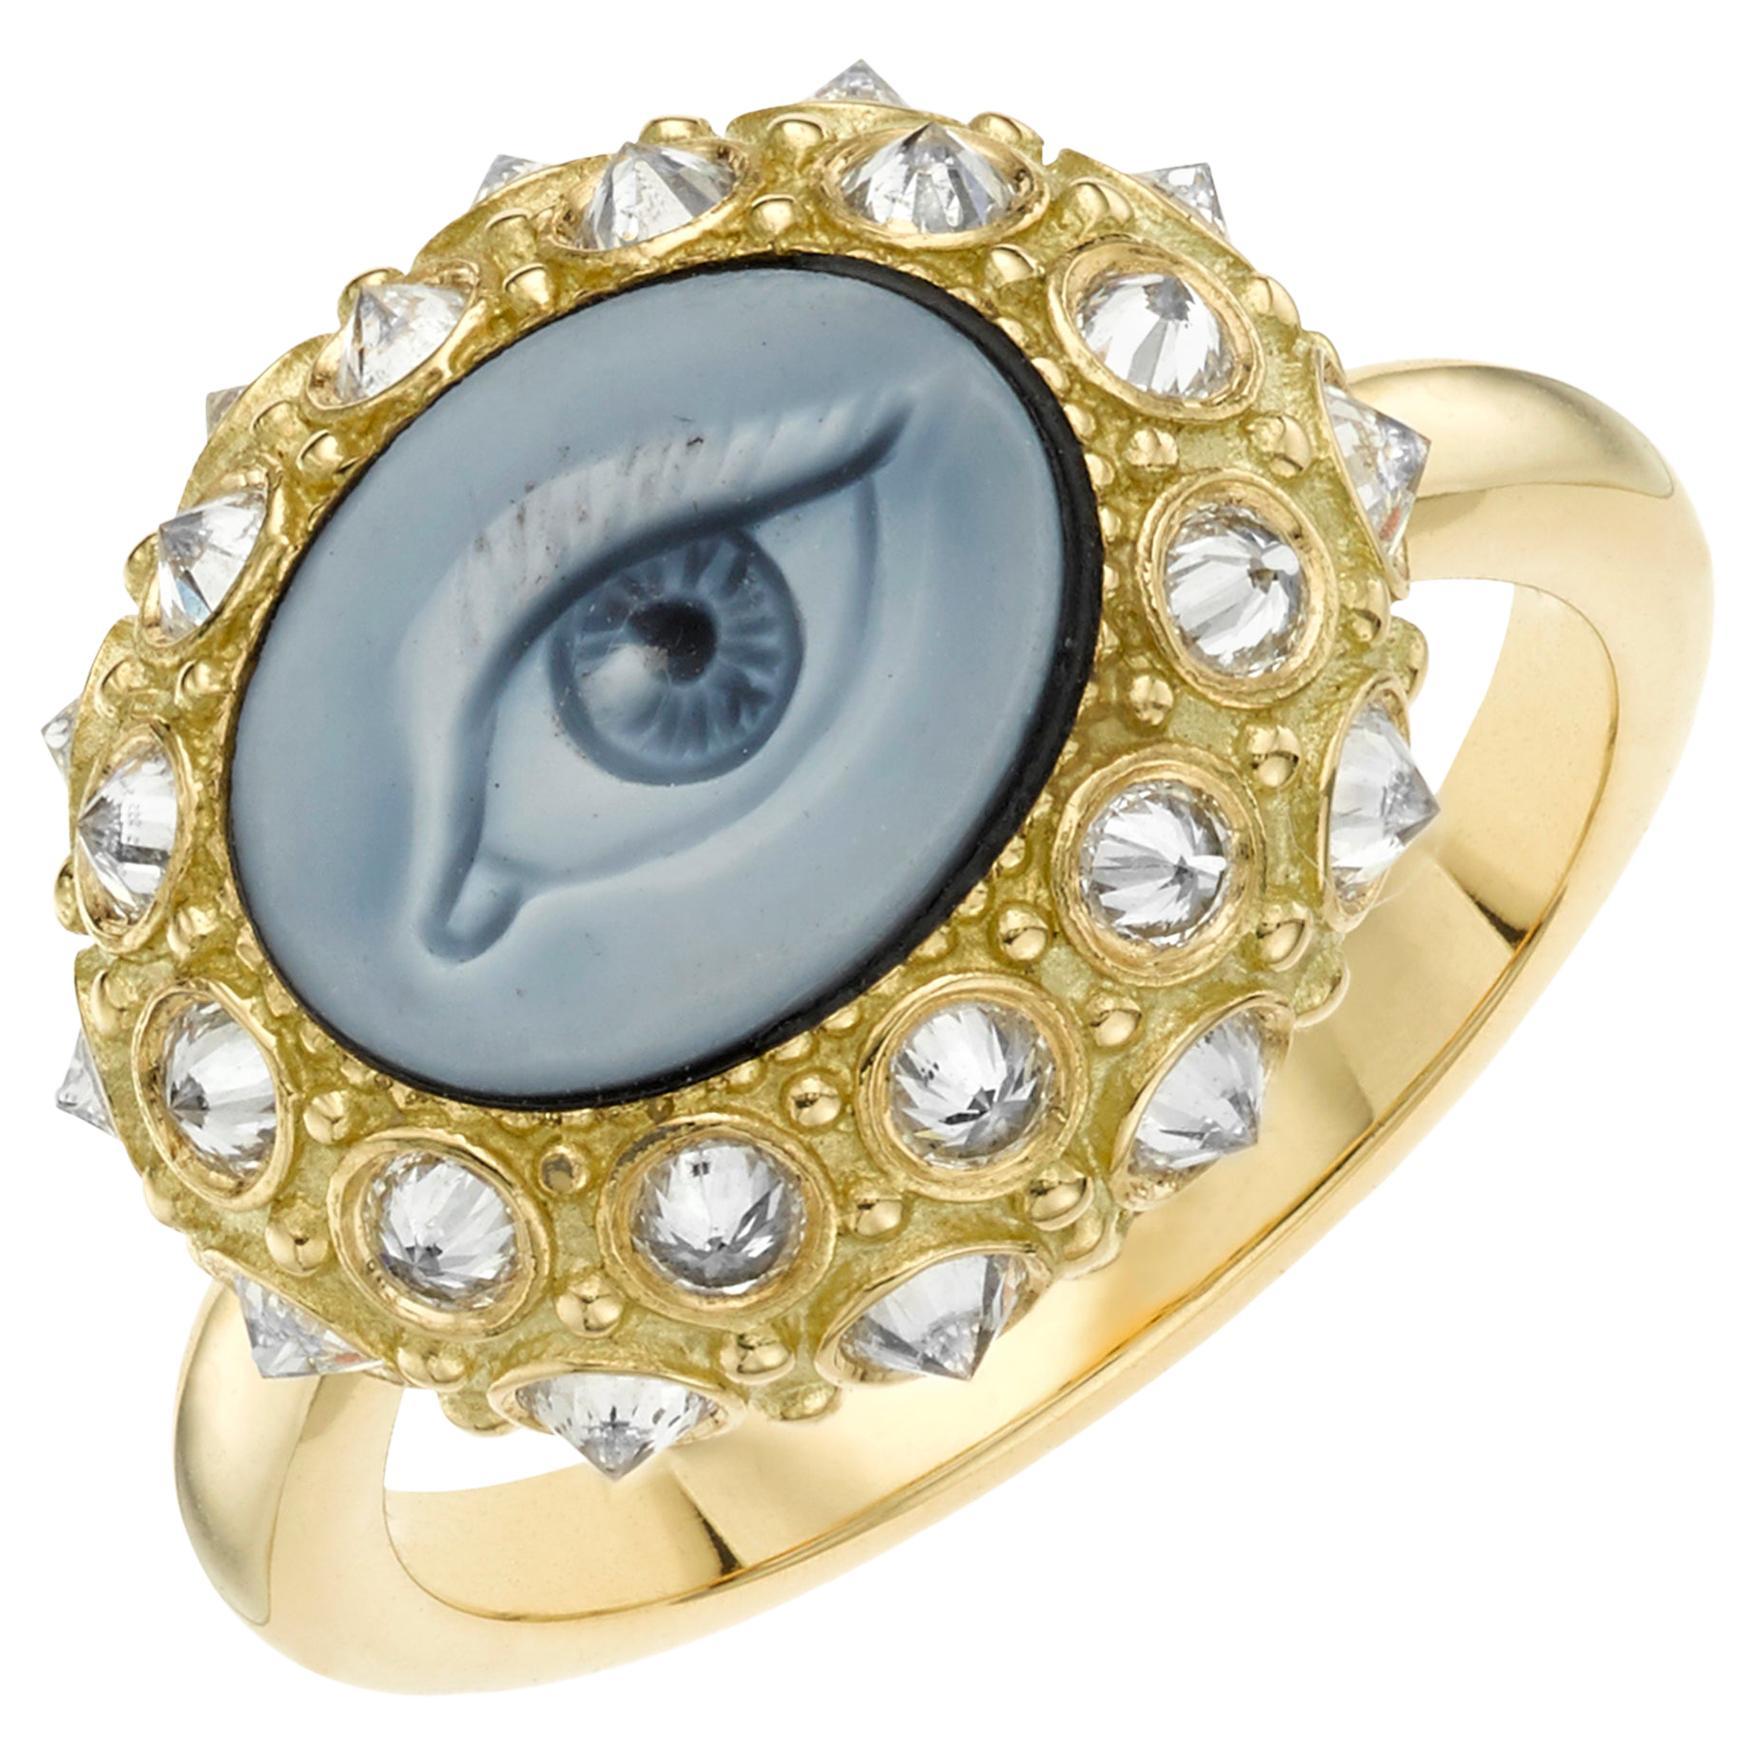 AnaKatarina Customizable Carved, Agate Cameo, 18k Gold, Diamonds 'Eye See' Ring